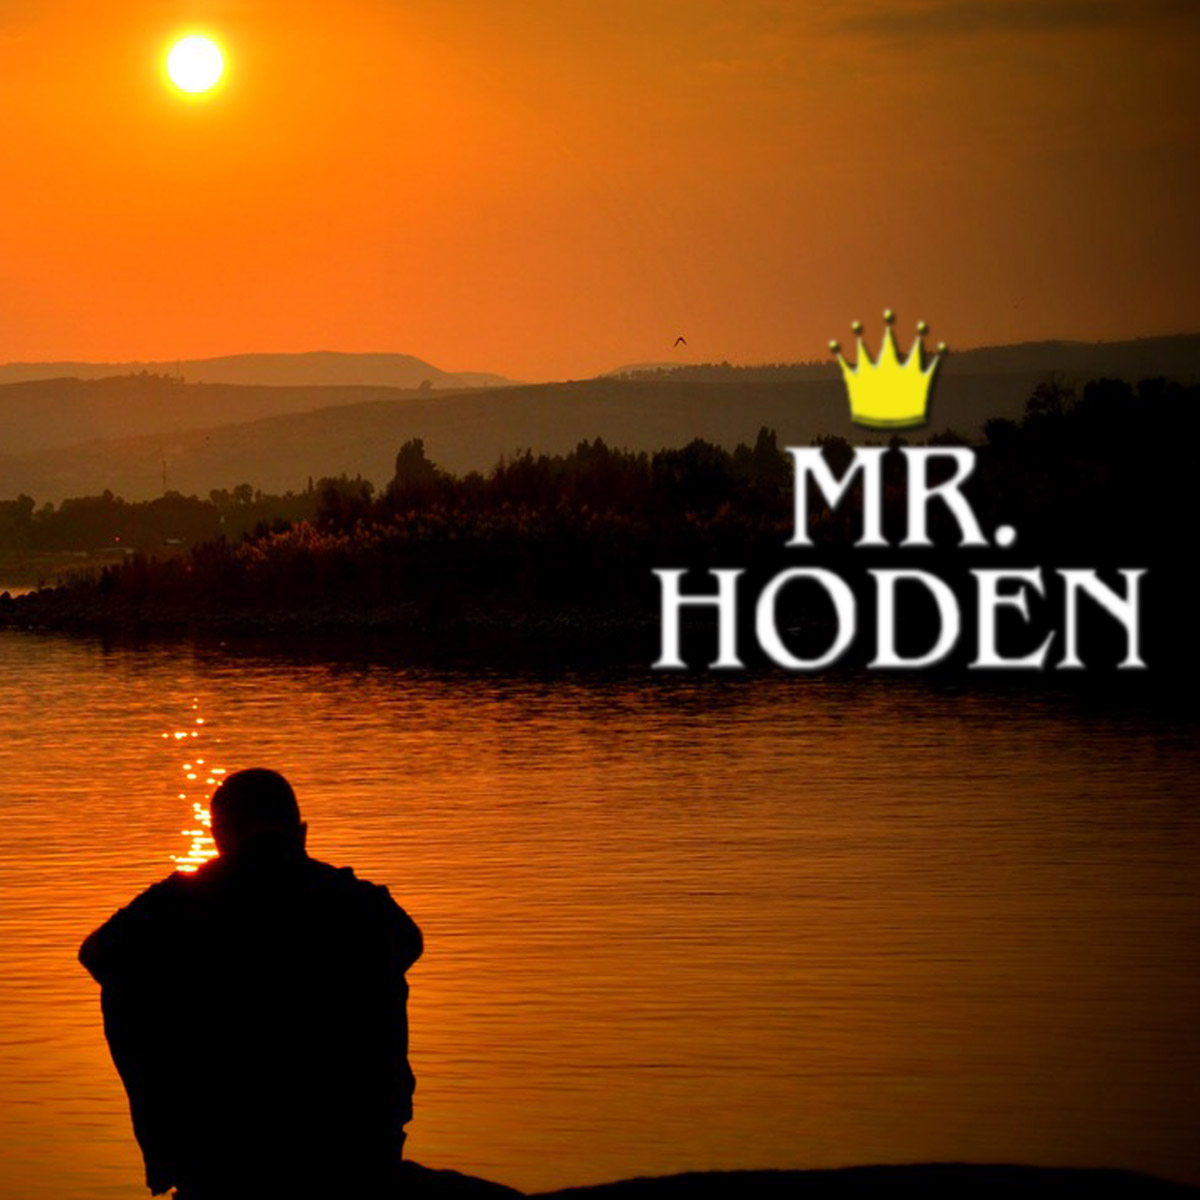 Upcoming: Mr. Hoden - Sad Piano Rap Beat 2019 [FREE BEAT]